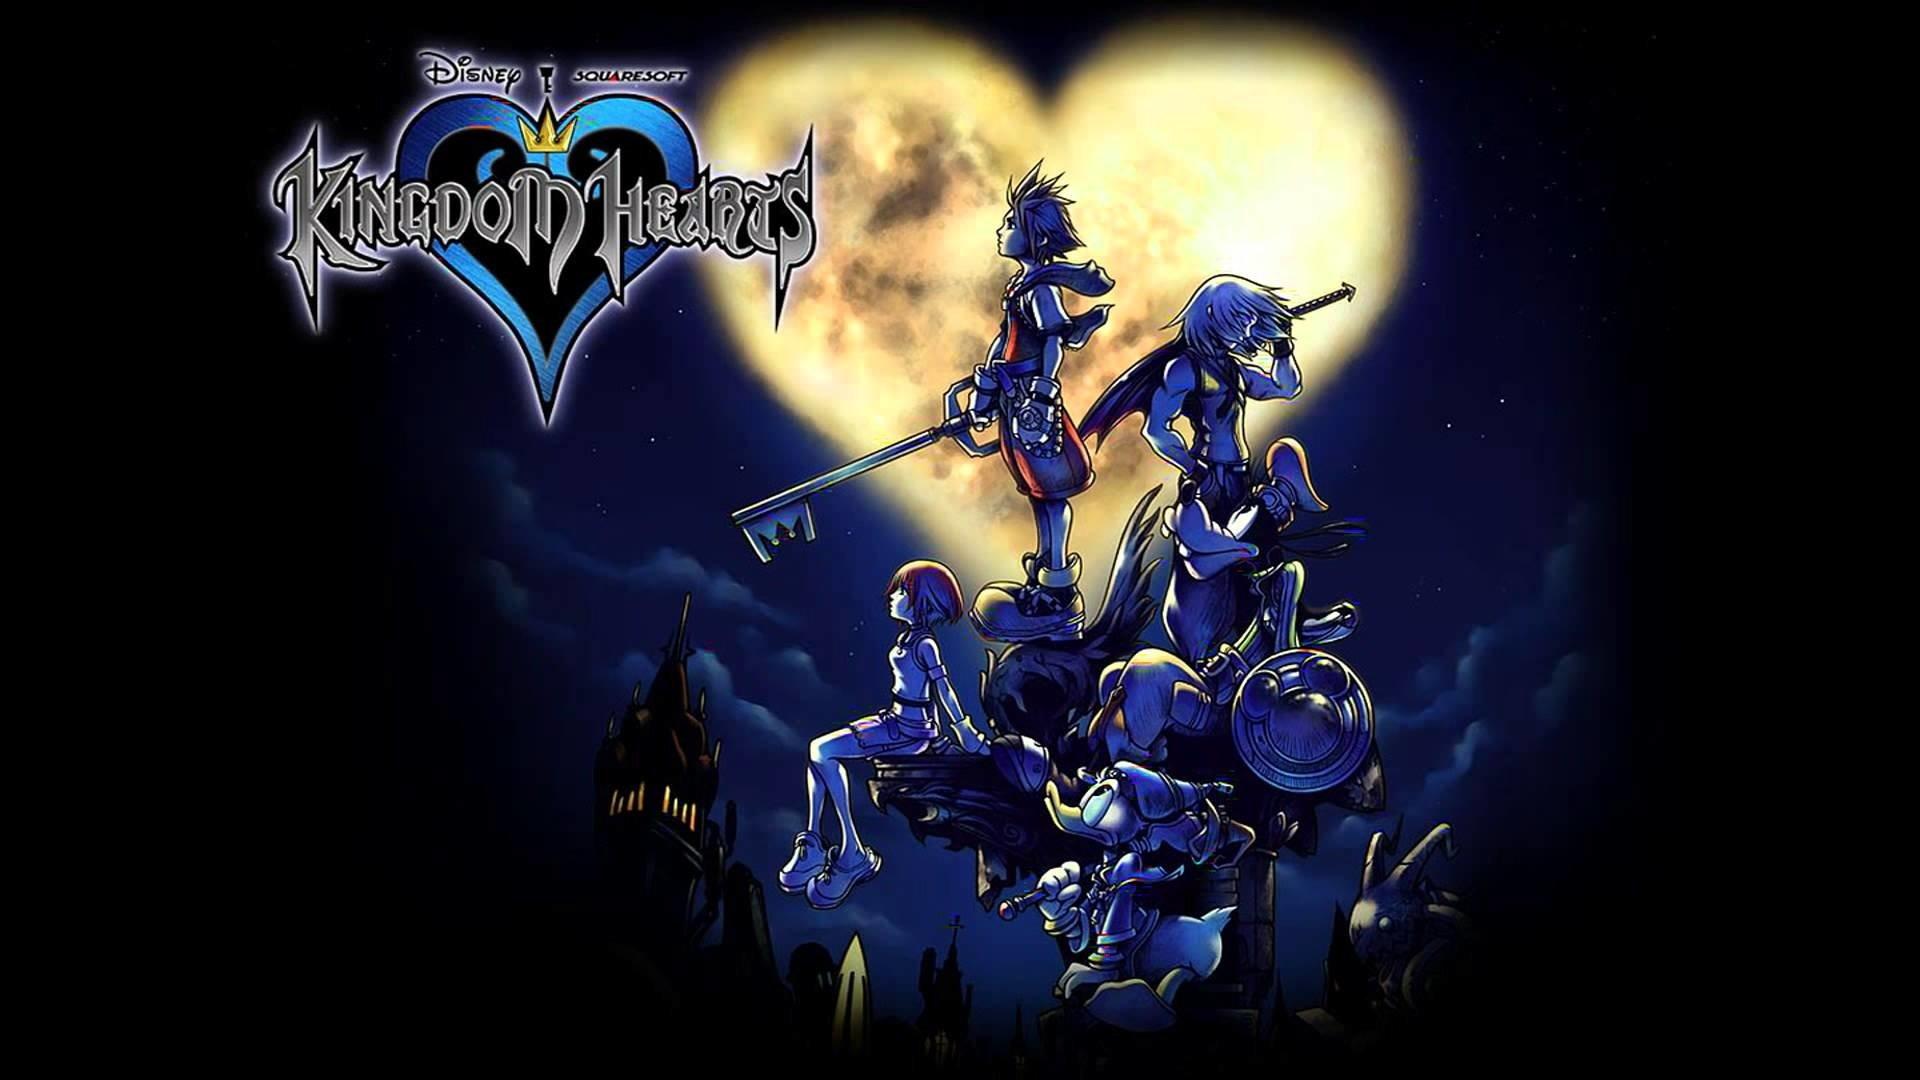 Kingdom Hearts Wallpaper Hd Wallpaper Background Image